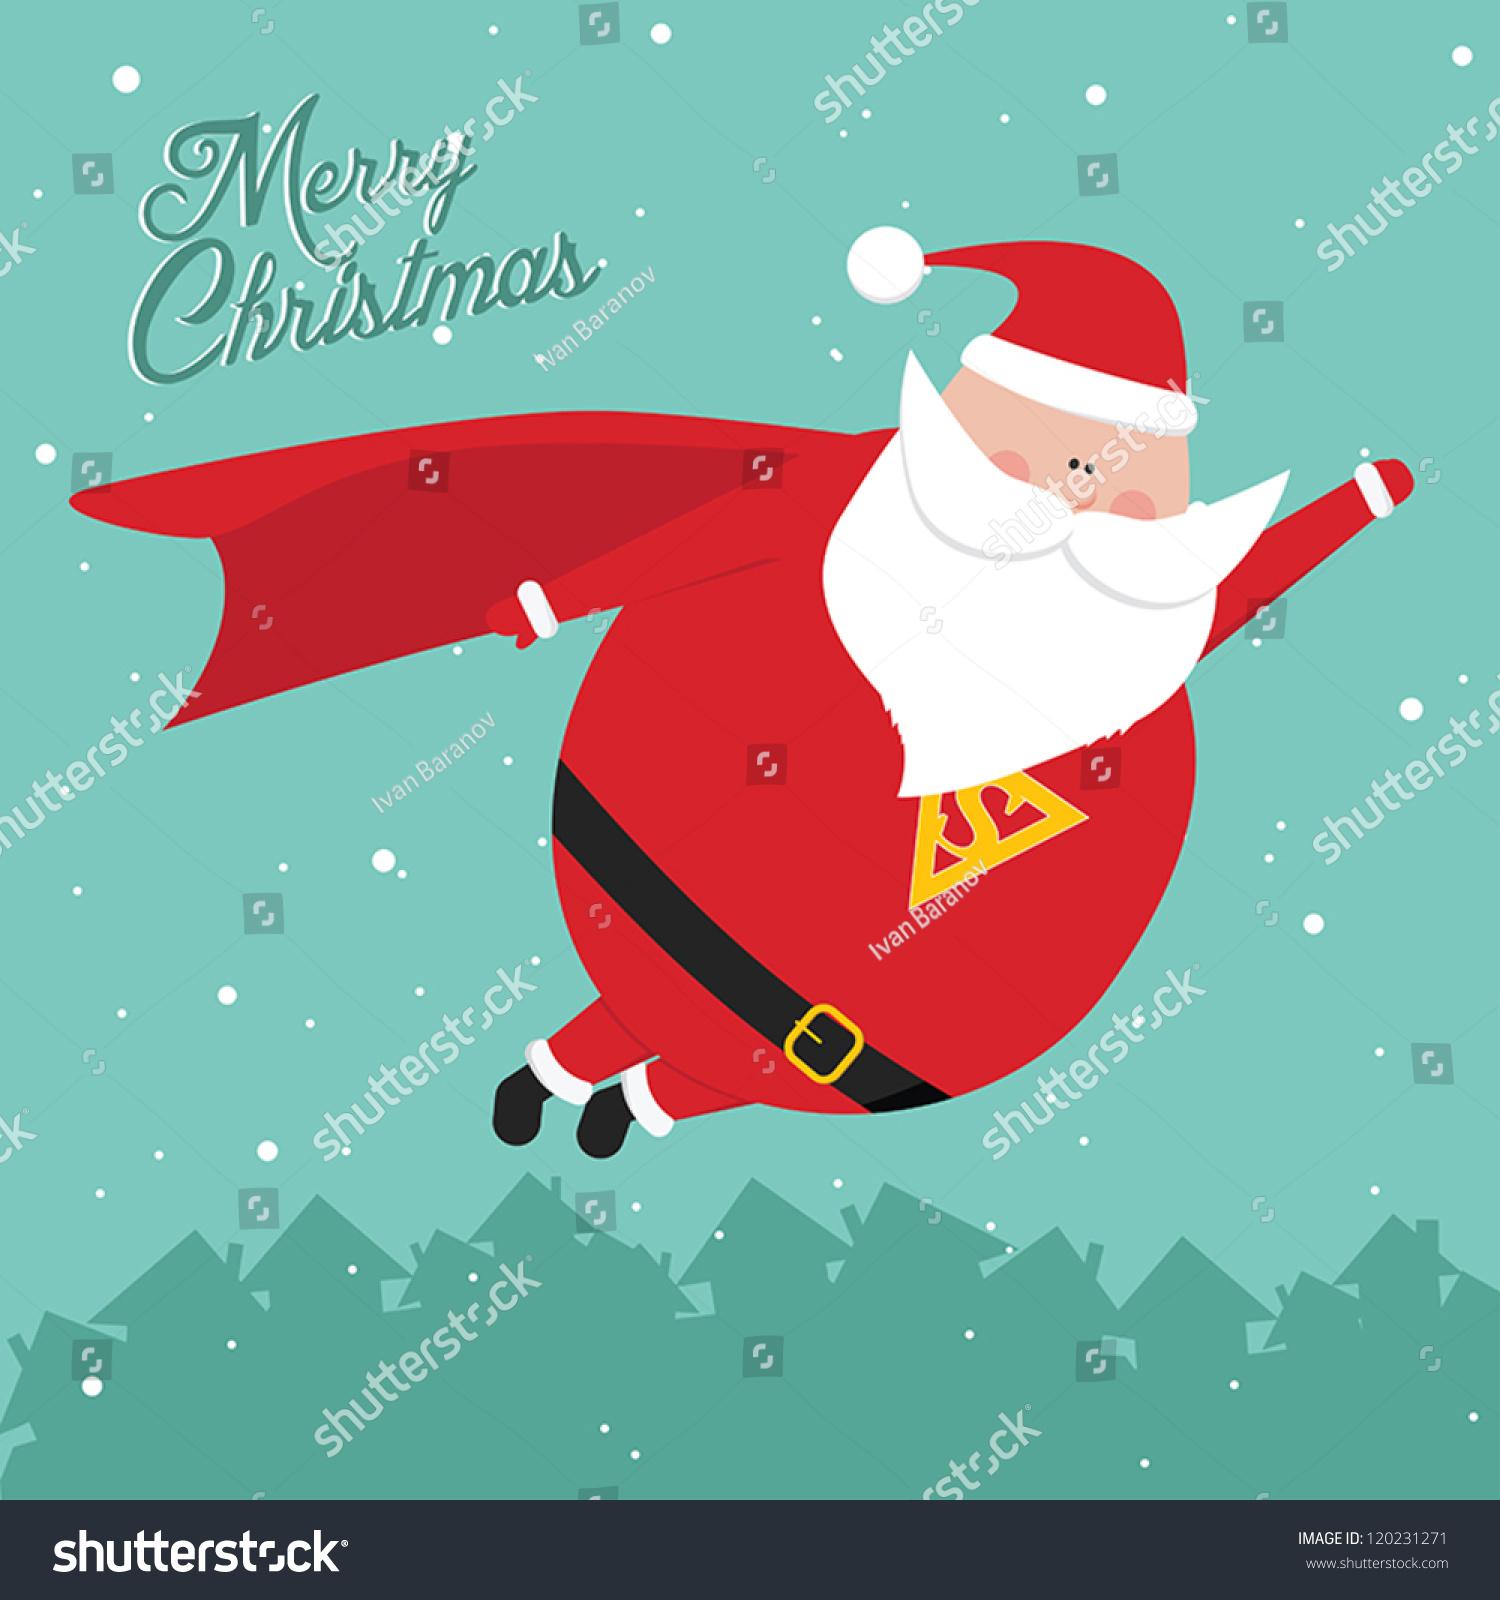 funny retro vintage merry christmas santaman postcard stock vector illustration 120231271